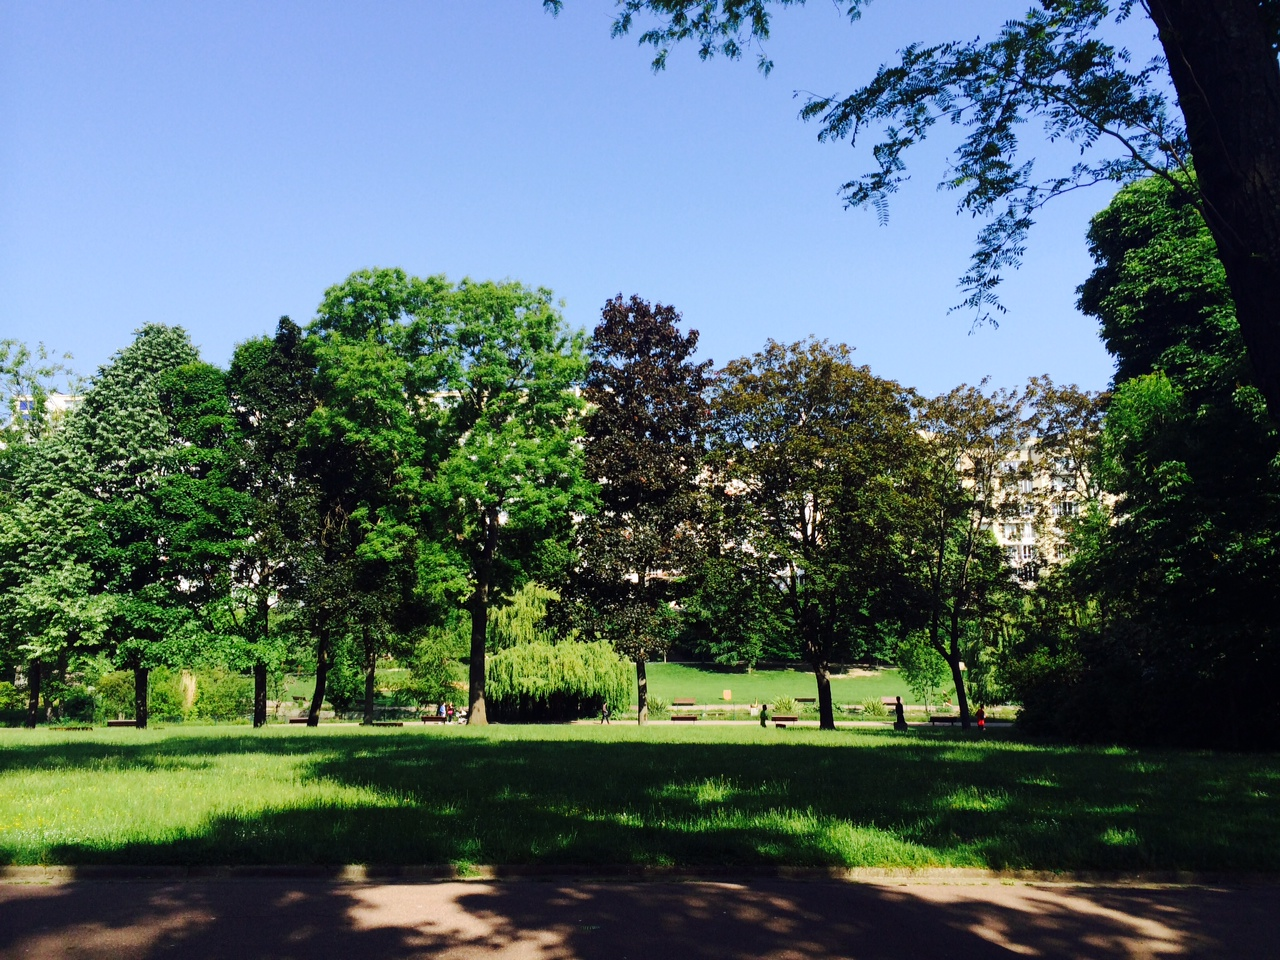 parc cor mai 2015 1